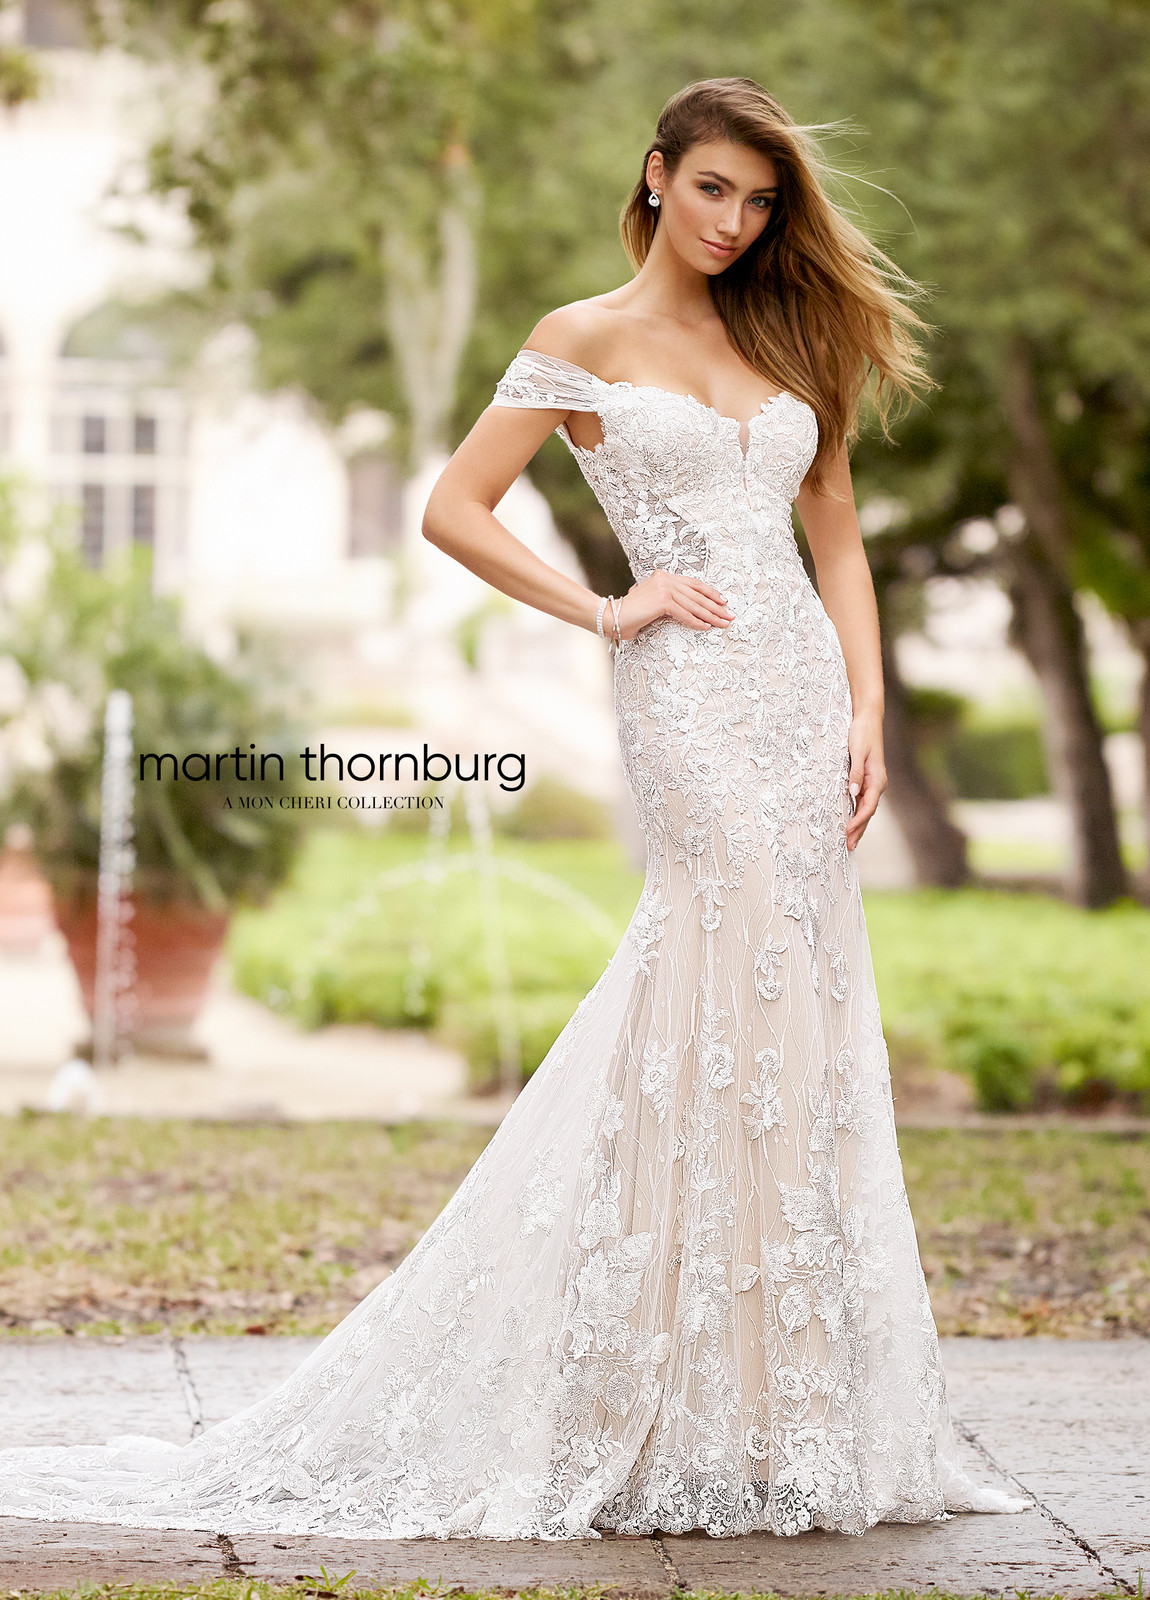 342451c38a3 Martin Thornburg Style 218224 Luna